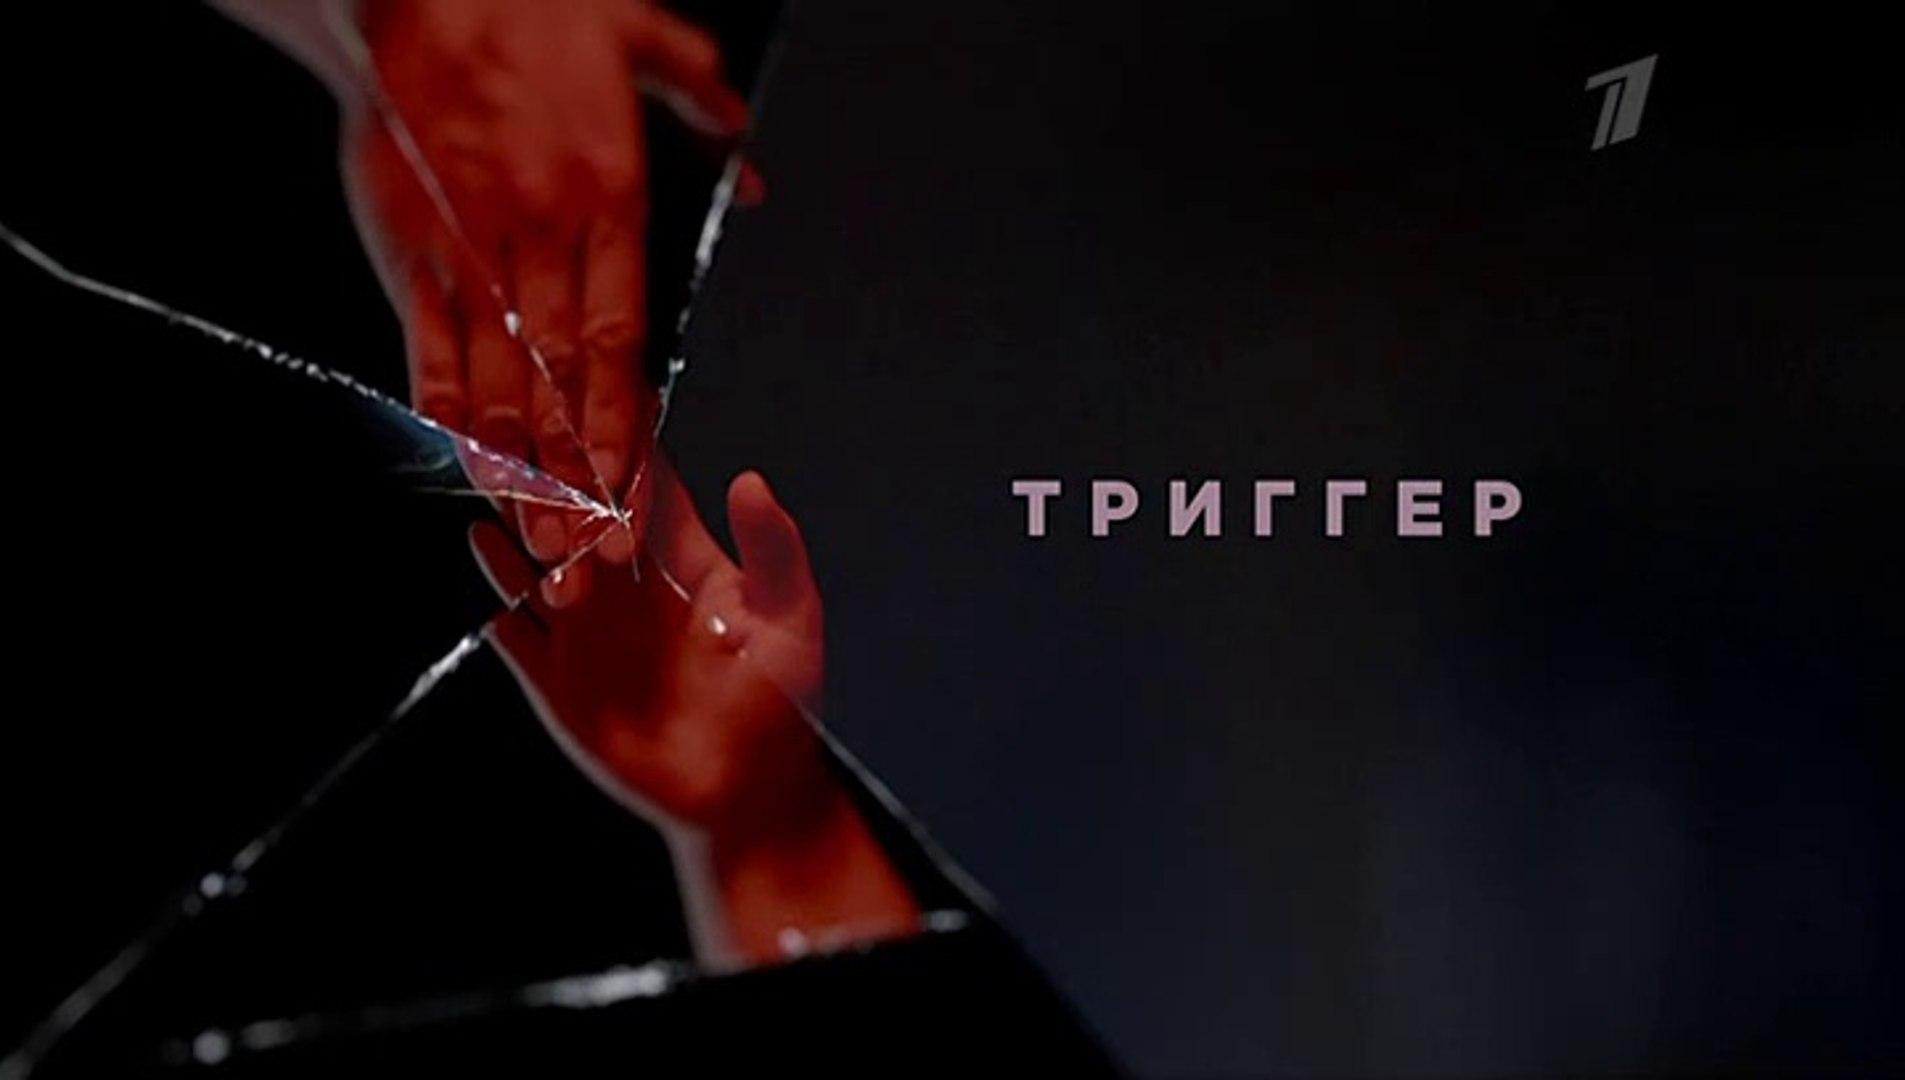 Триггер - 7 серия (2020) HD смотреть онлайн